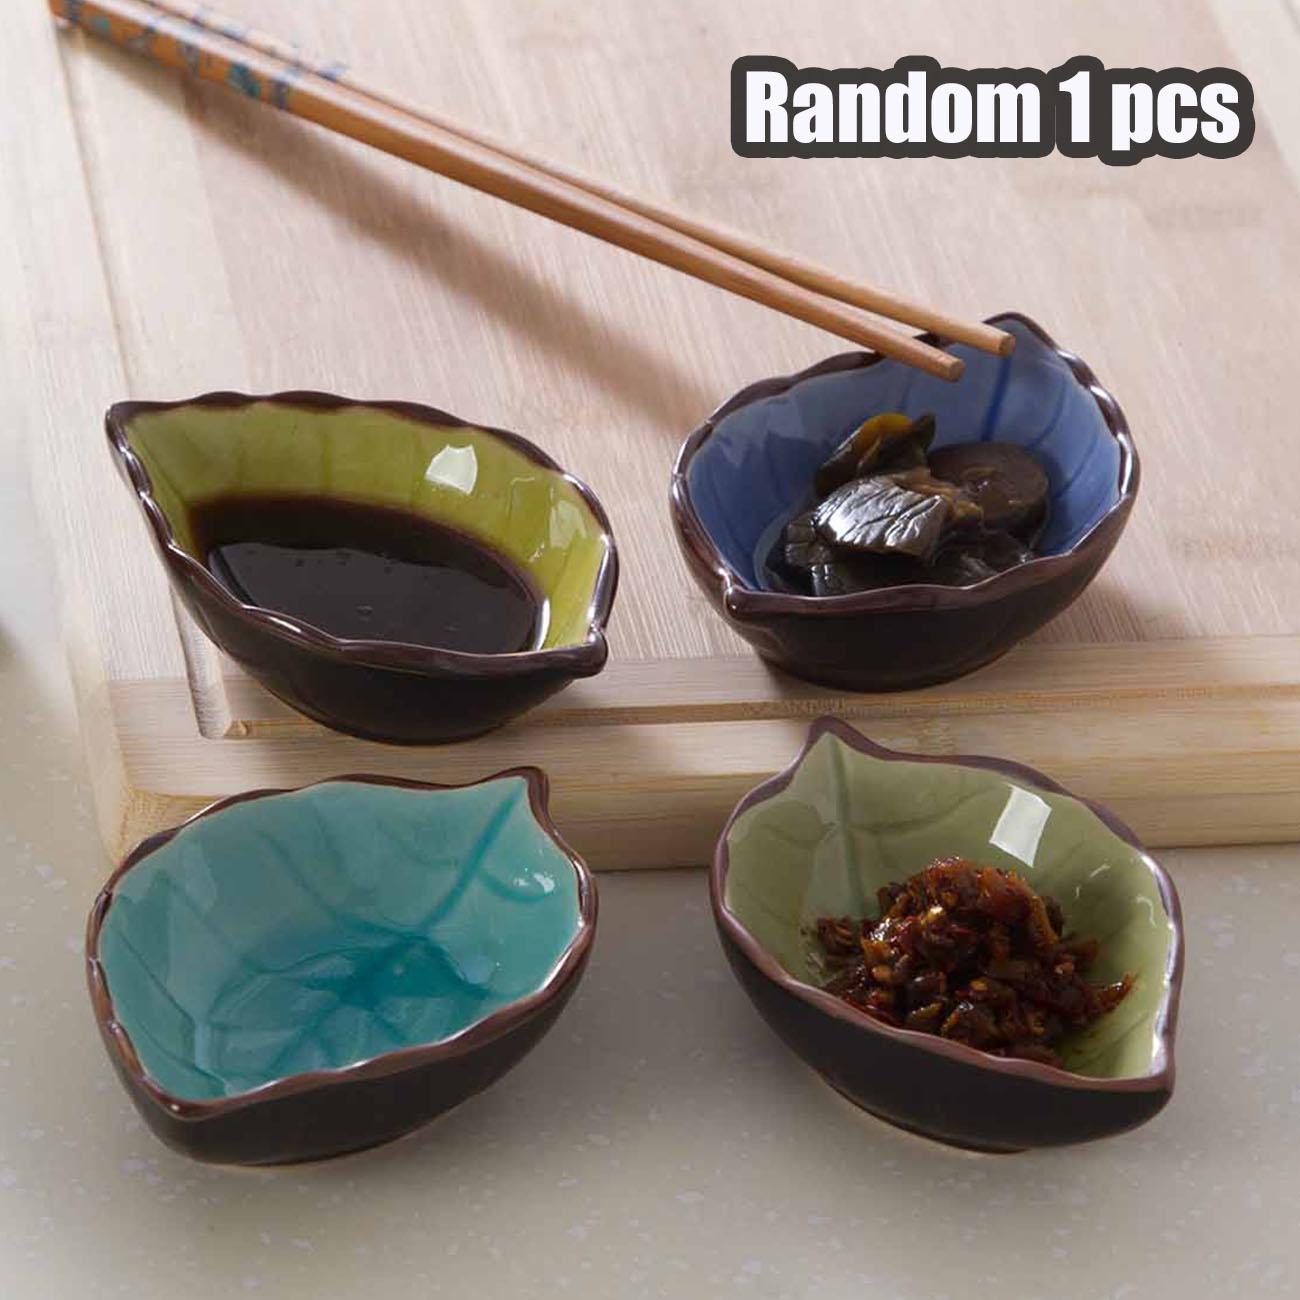 Stocomodi 1 Pcs Random Color Dinnerware Ceramic Glaze Leaf-shape Seasoning Dish